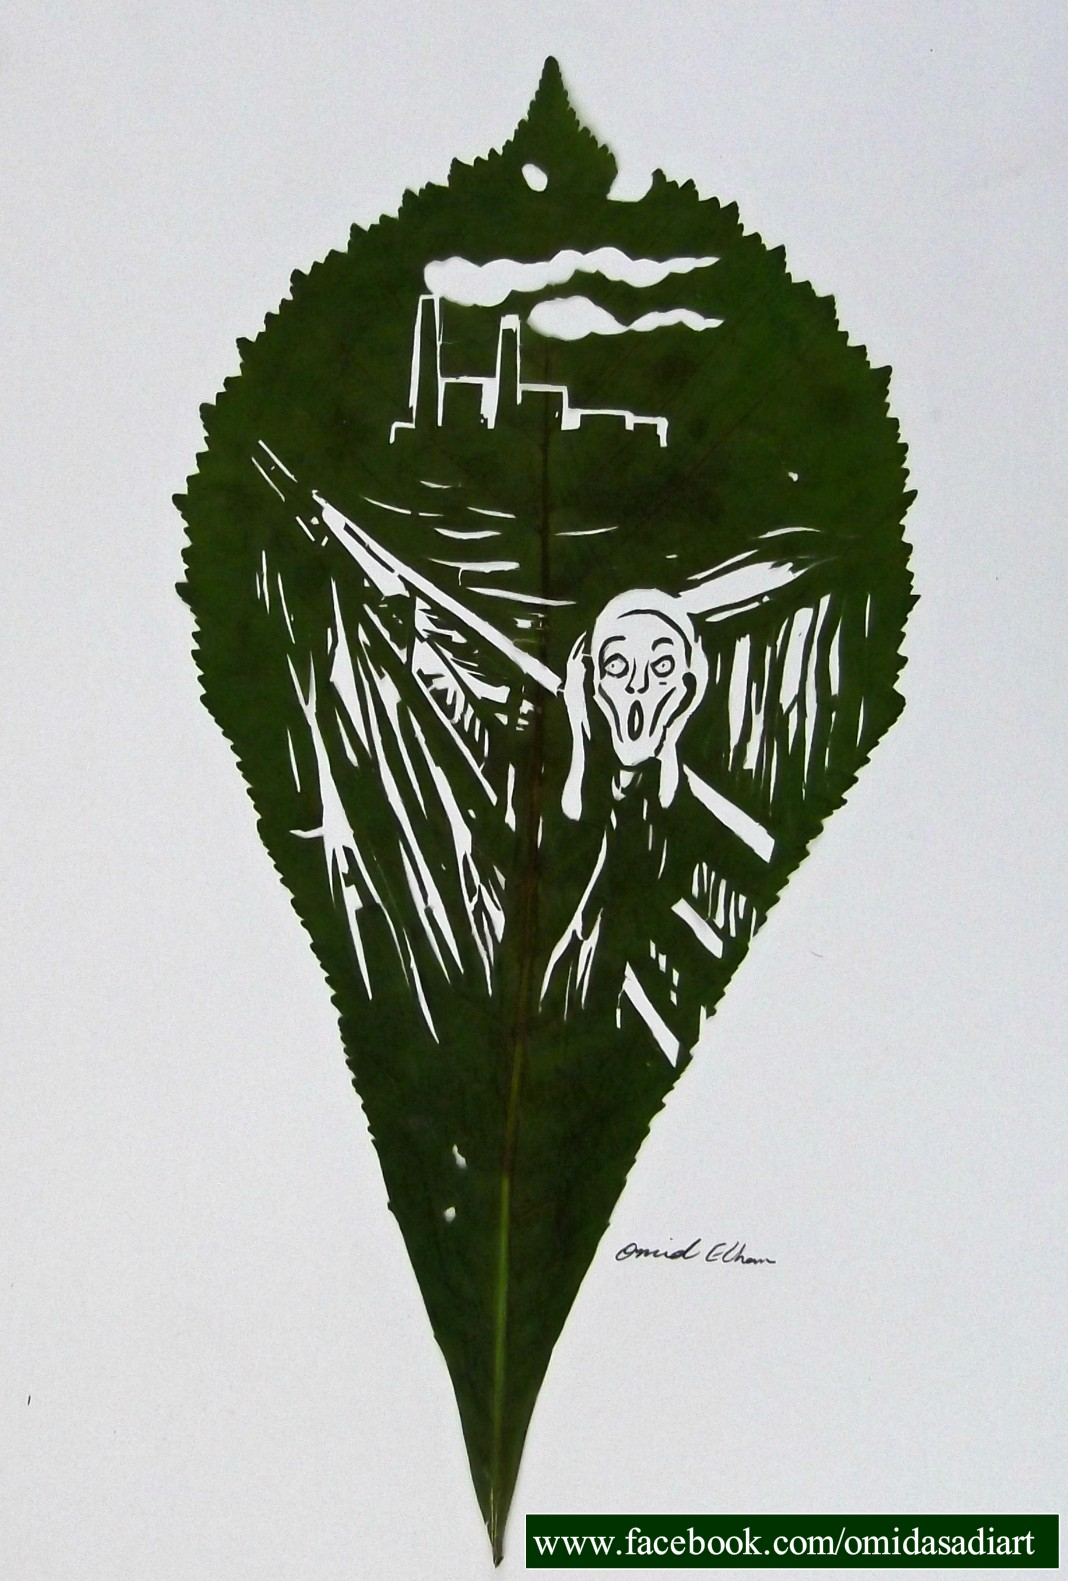 Omid-asadi-01